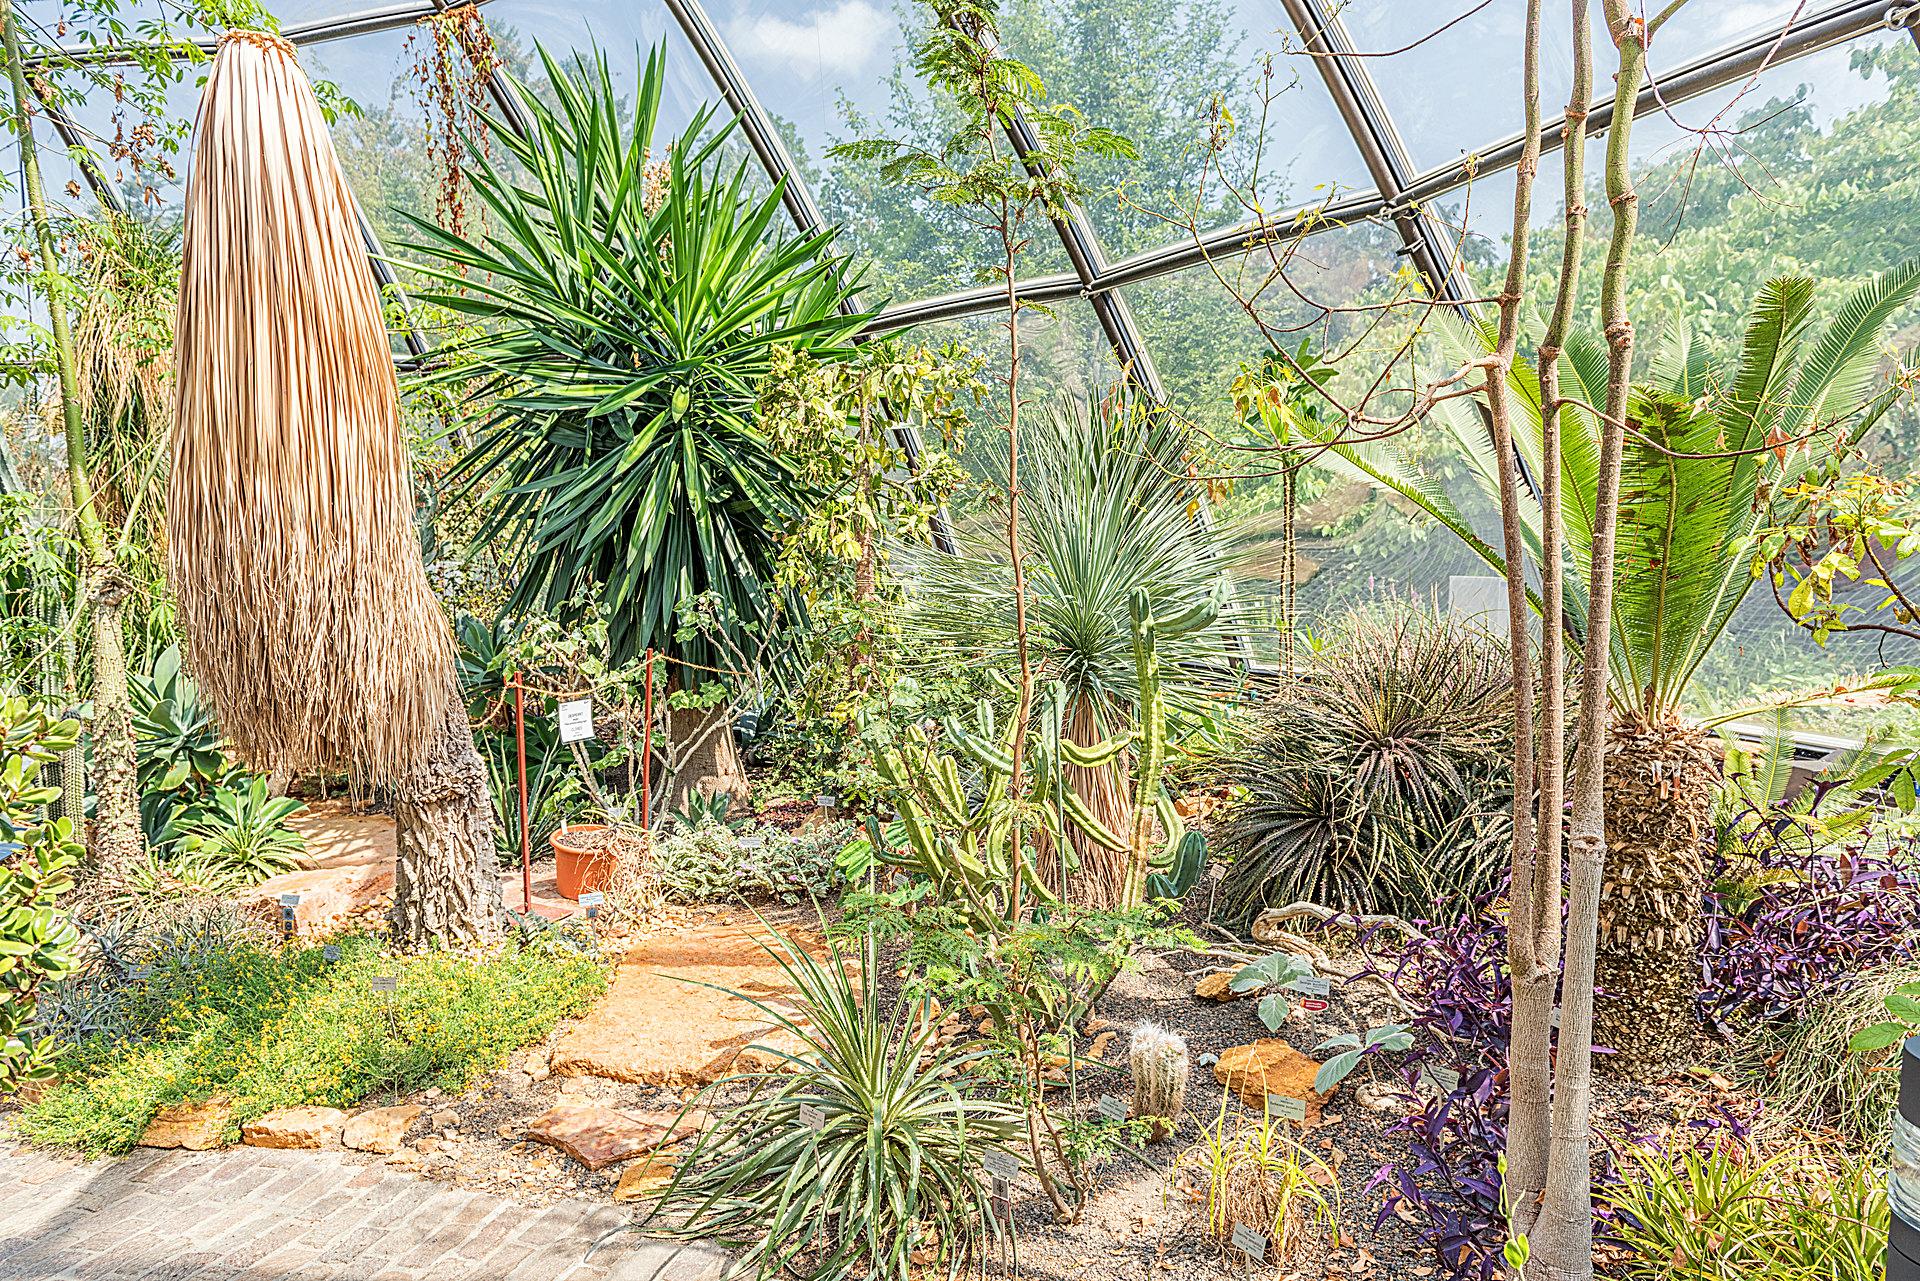 Botanischer Garten Zürich - Tropenhaus Tropische Trockengebiete - Botanischer Garten